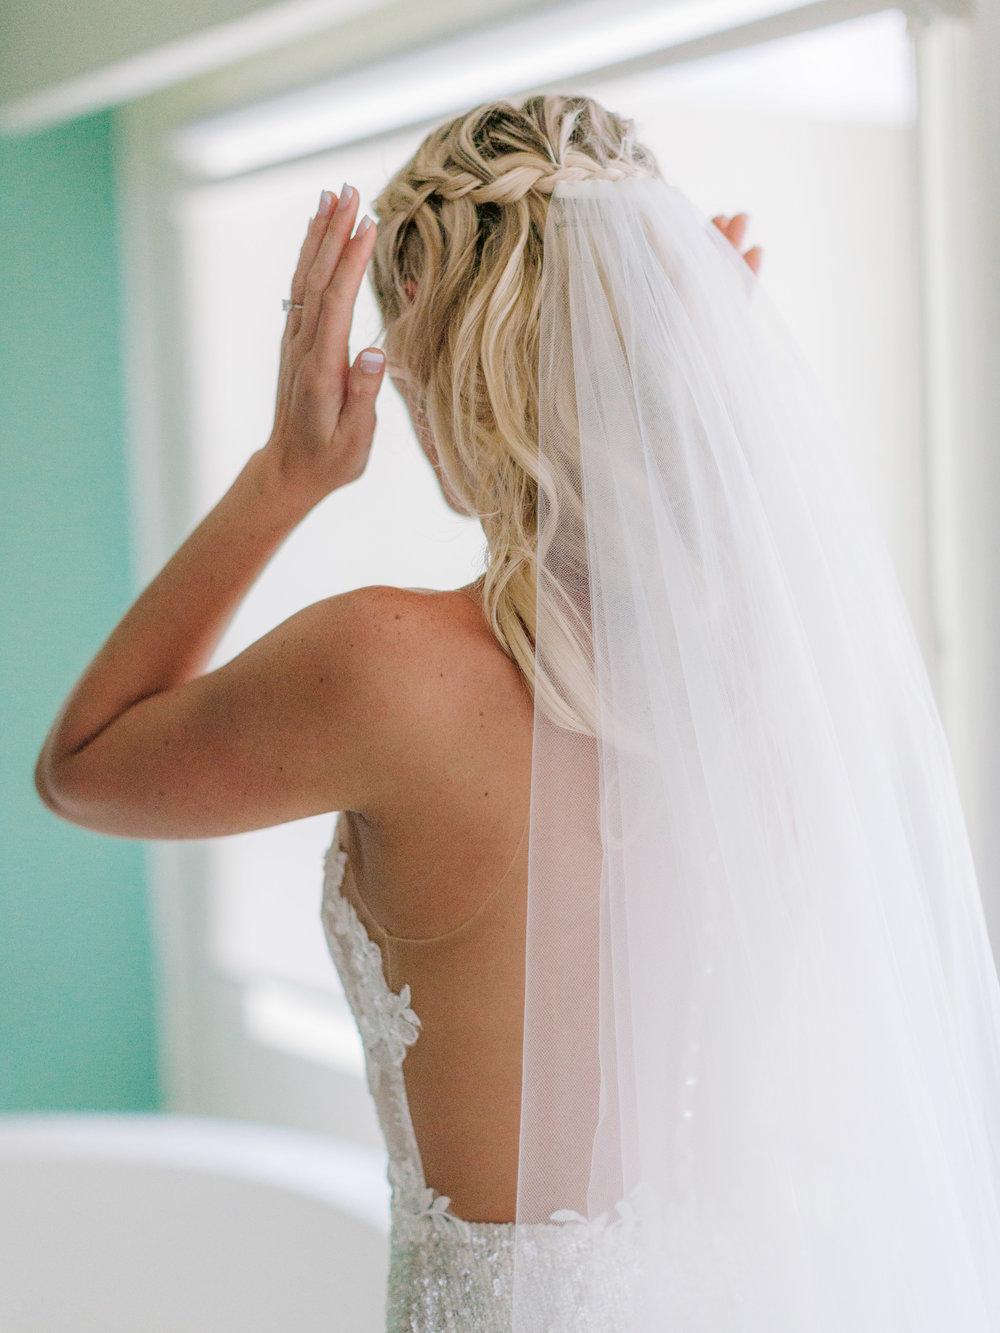 Kim_Jeff_Cancun Wedding_Getting_Ready_Kurtz_Orpia (66 of 105).jpg